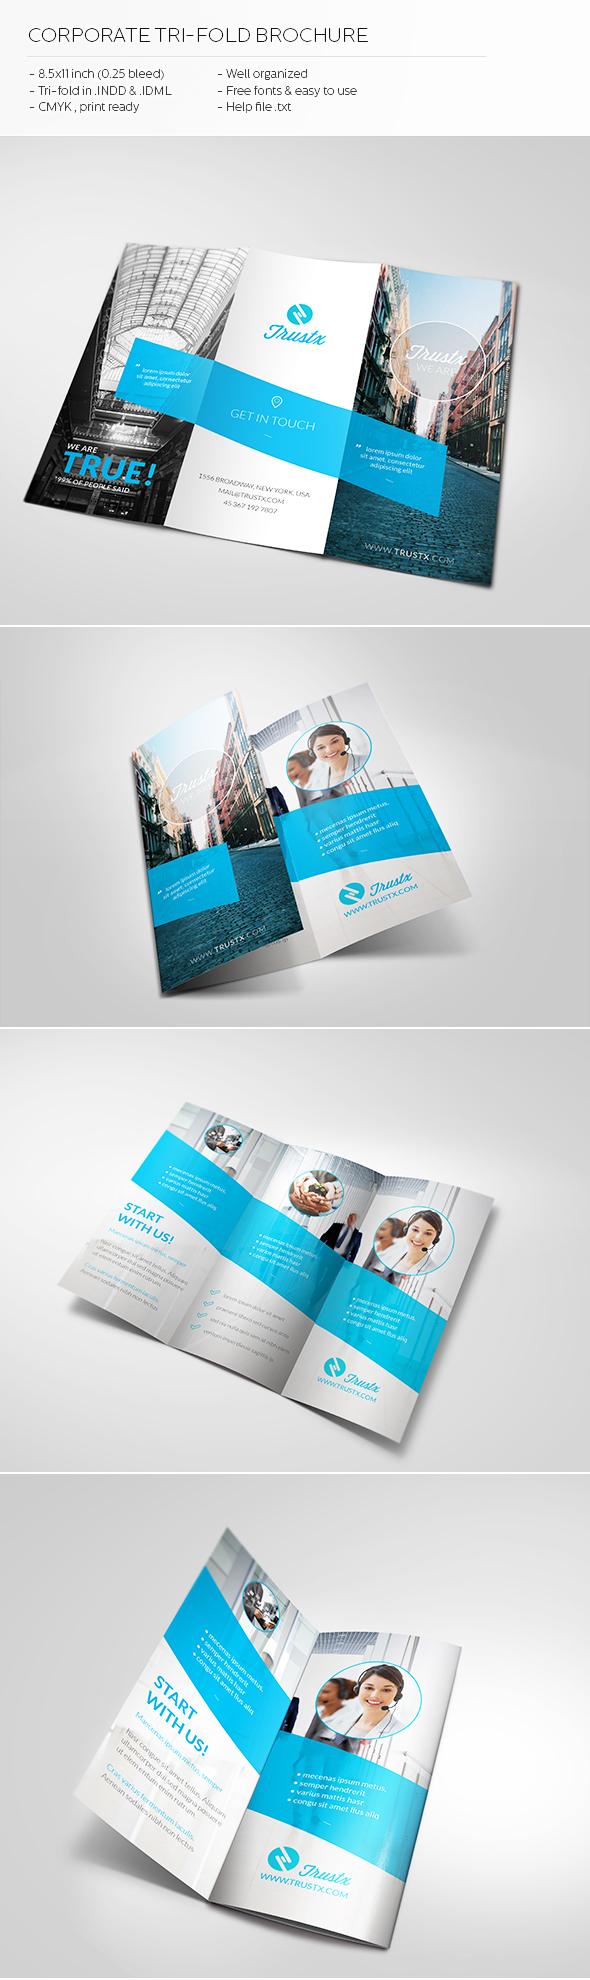 Brosur Perusahaan - Trustx Corporate Tri-fold Brochure